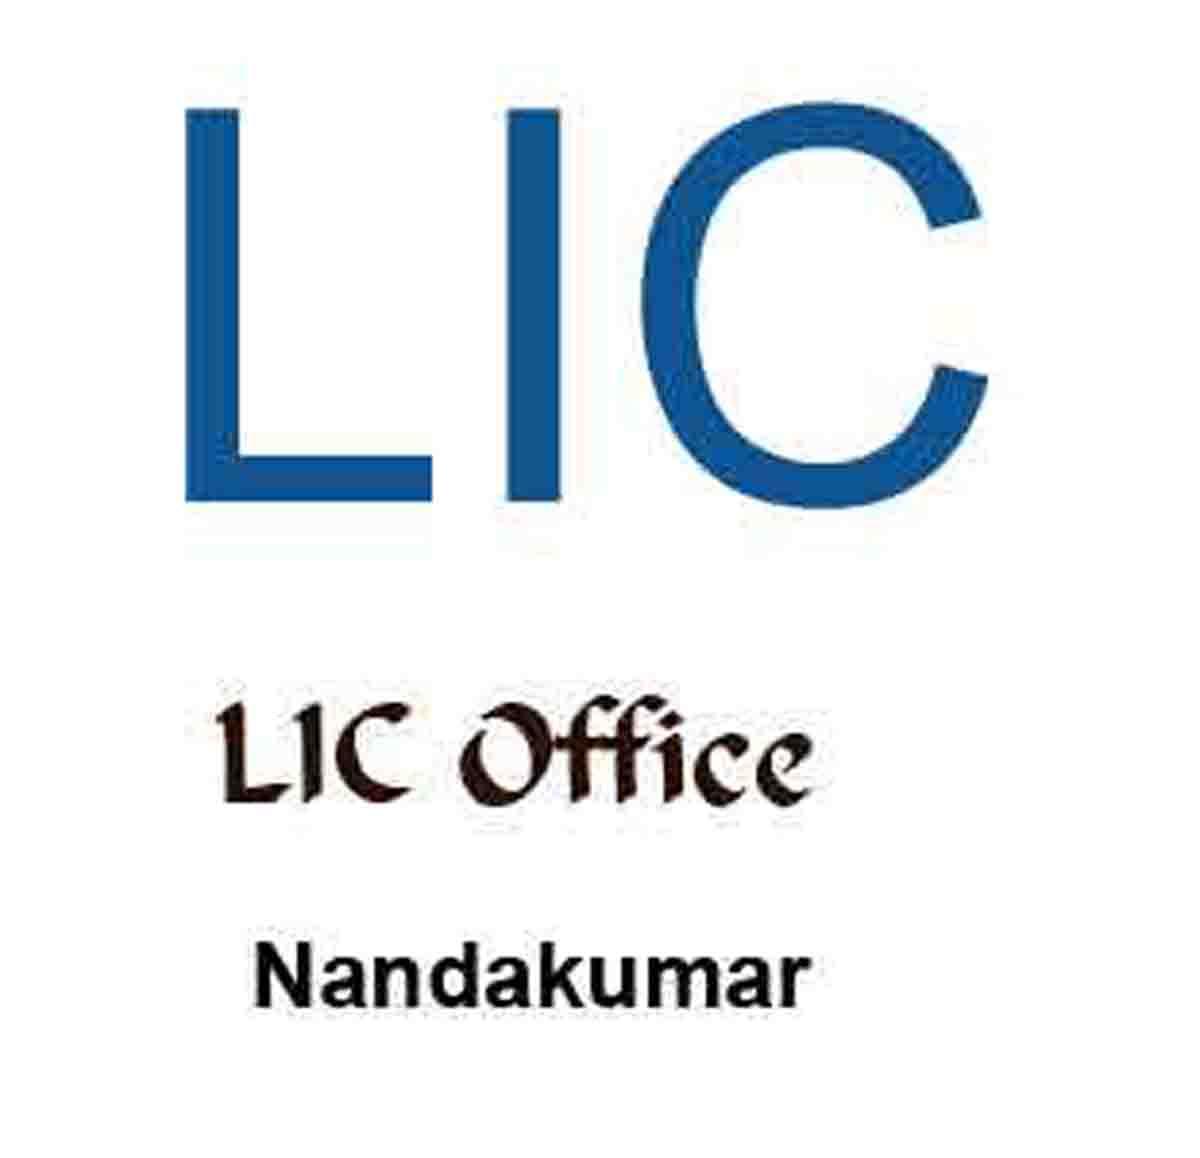 lic office nandakumar